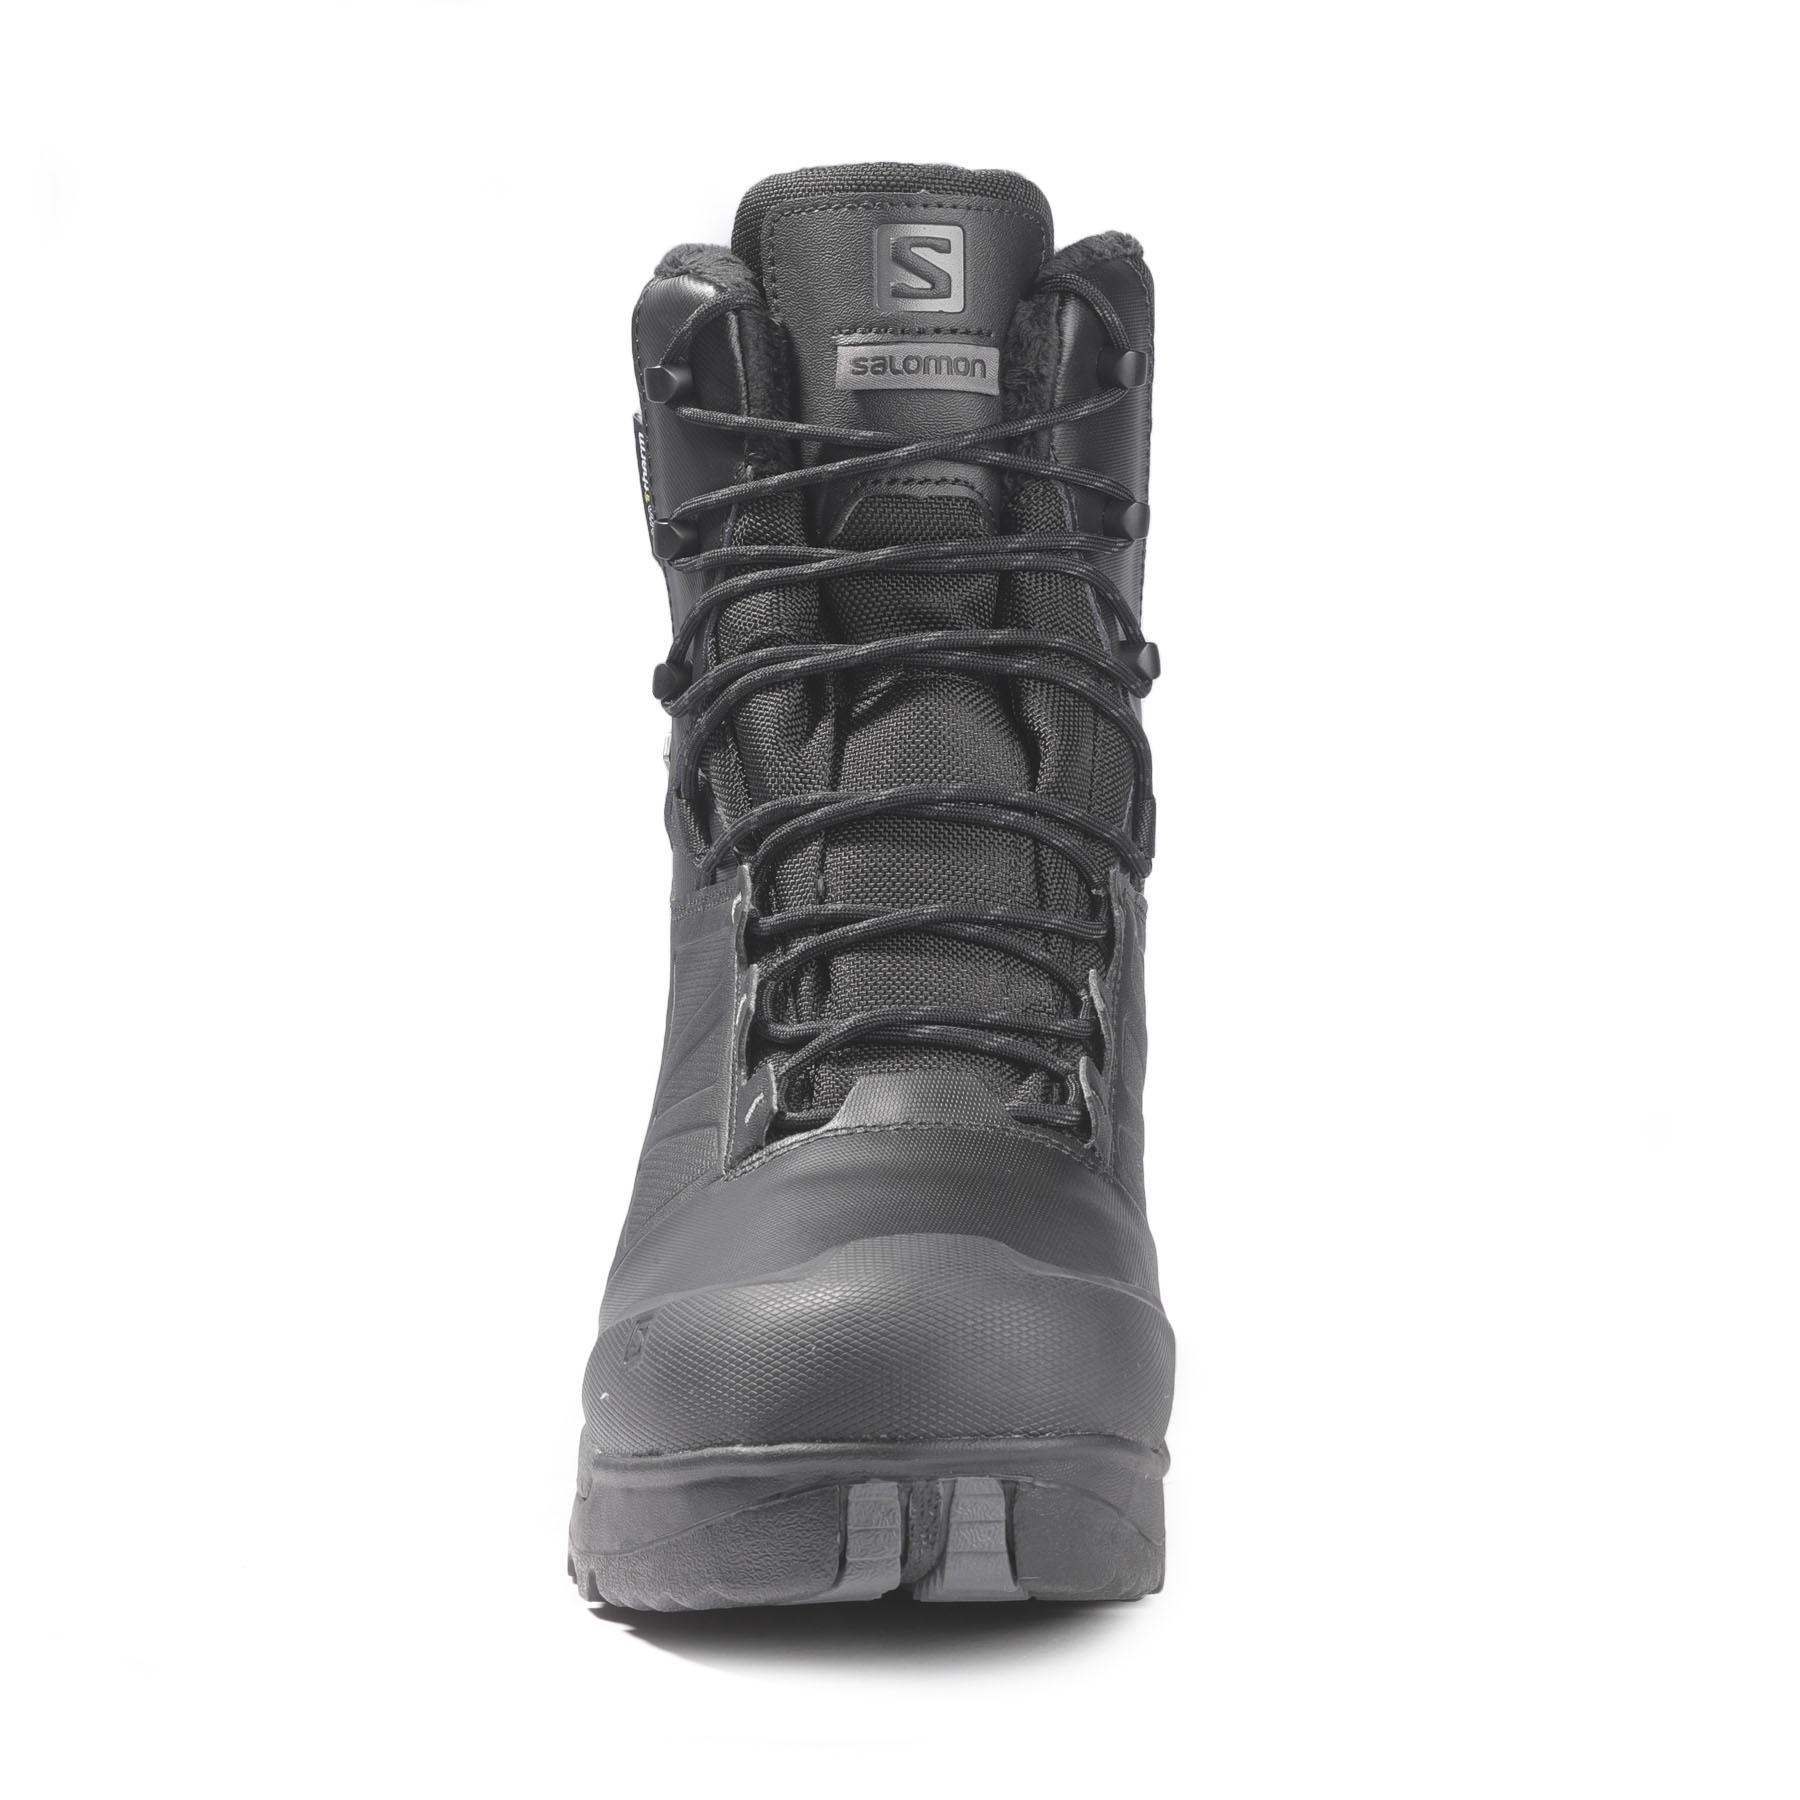 cb36cf0ef4a Salomon Toundra Forces CSWP Boot